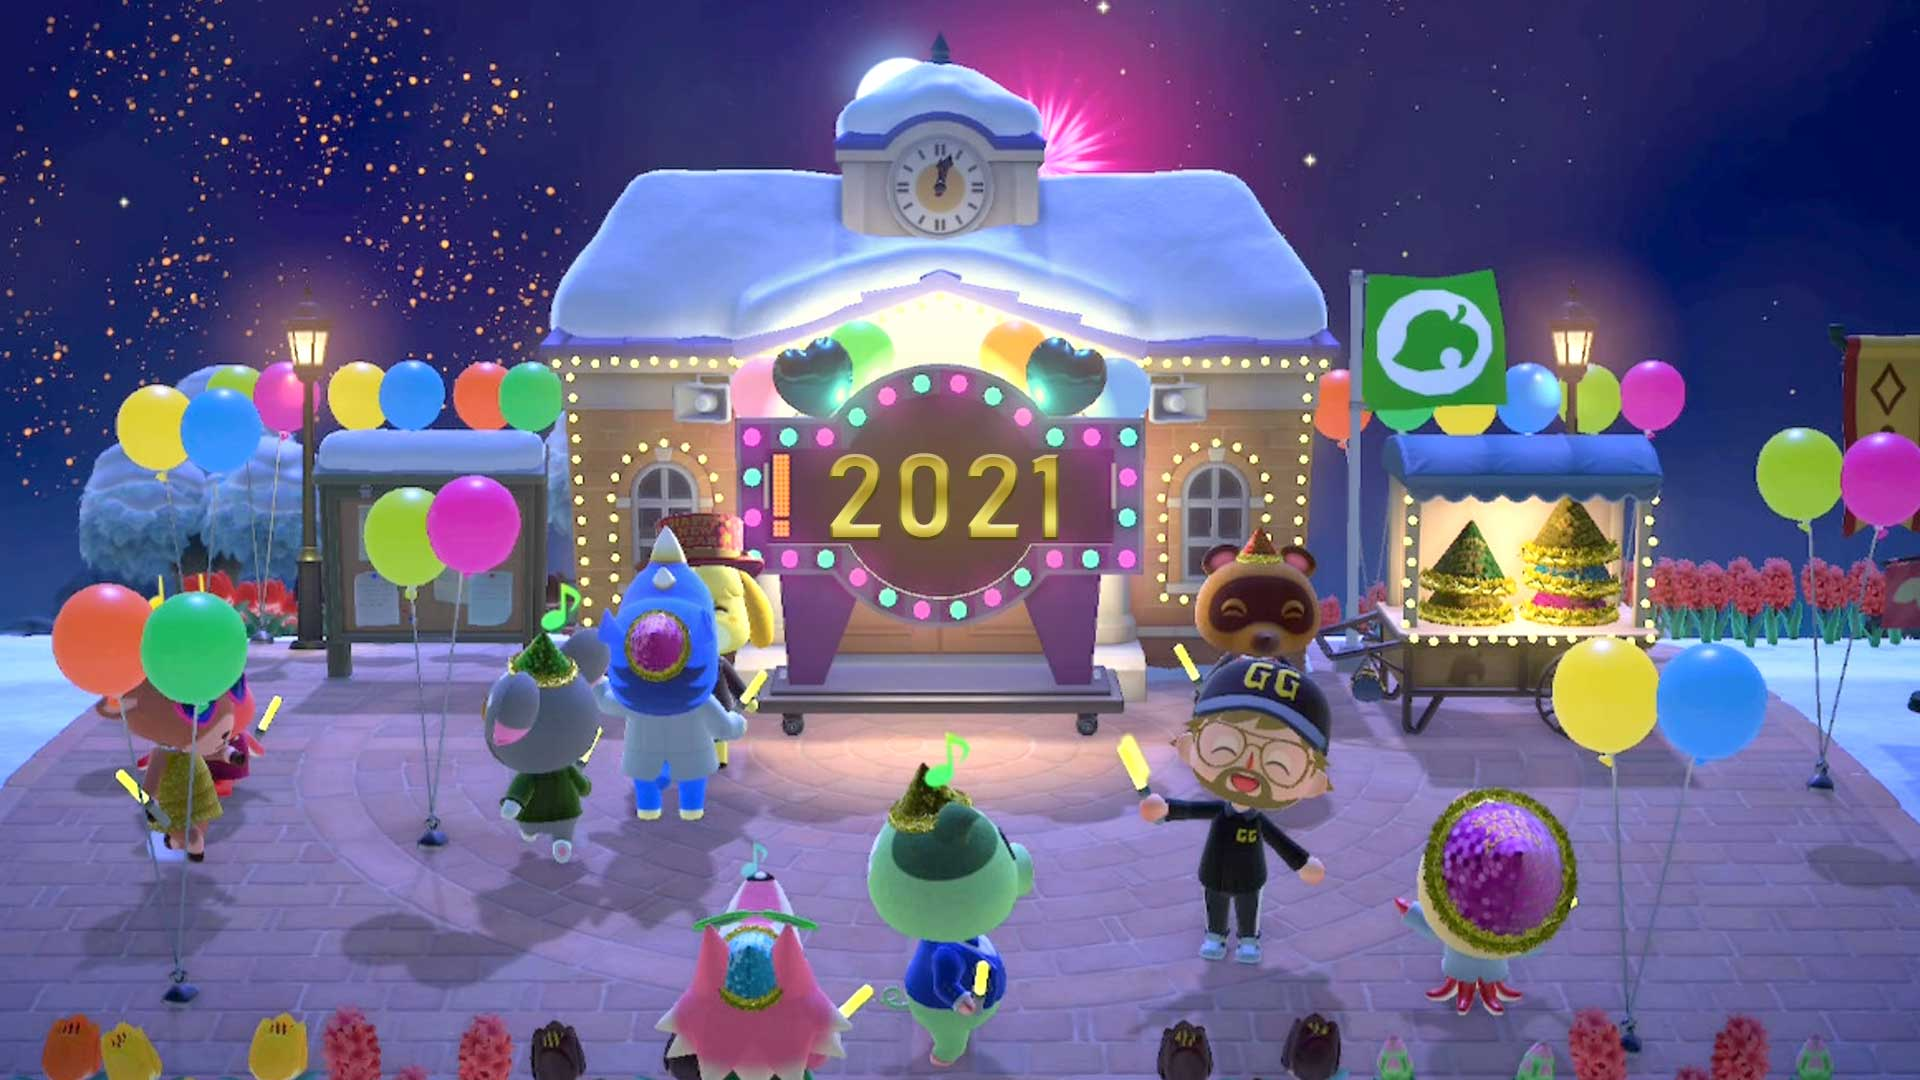 acnh new year 2021